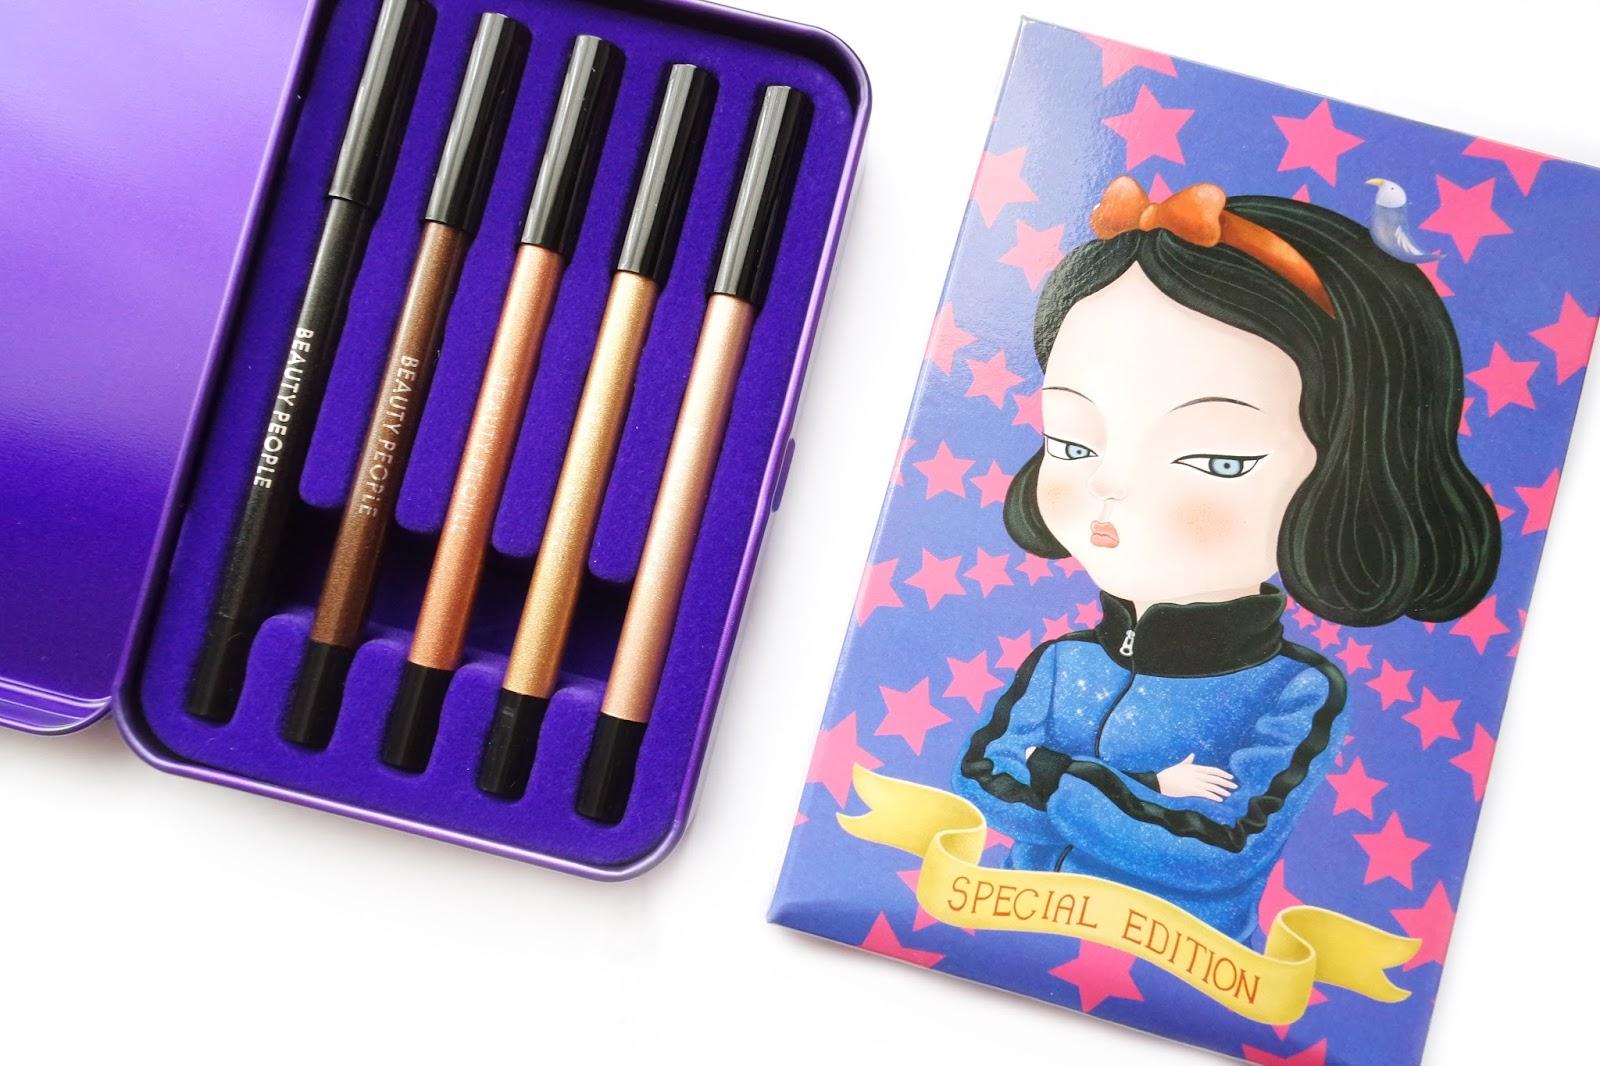 memebox superbox 41, review, twoplicates, beauty blog, eyeliners, moisturisers, skincare, haircare, makeup, beauty, fashion, lifestyle, masks, handcream, melbourne